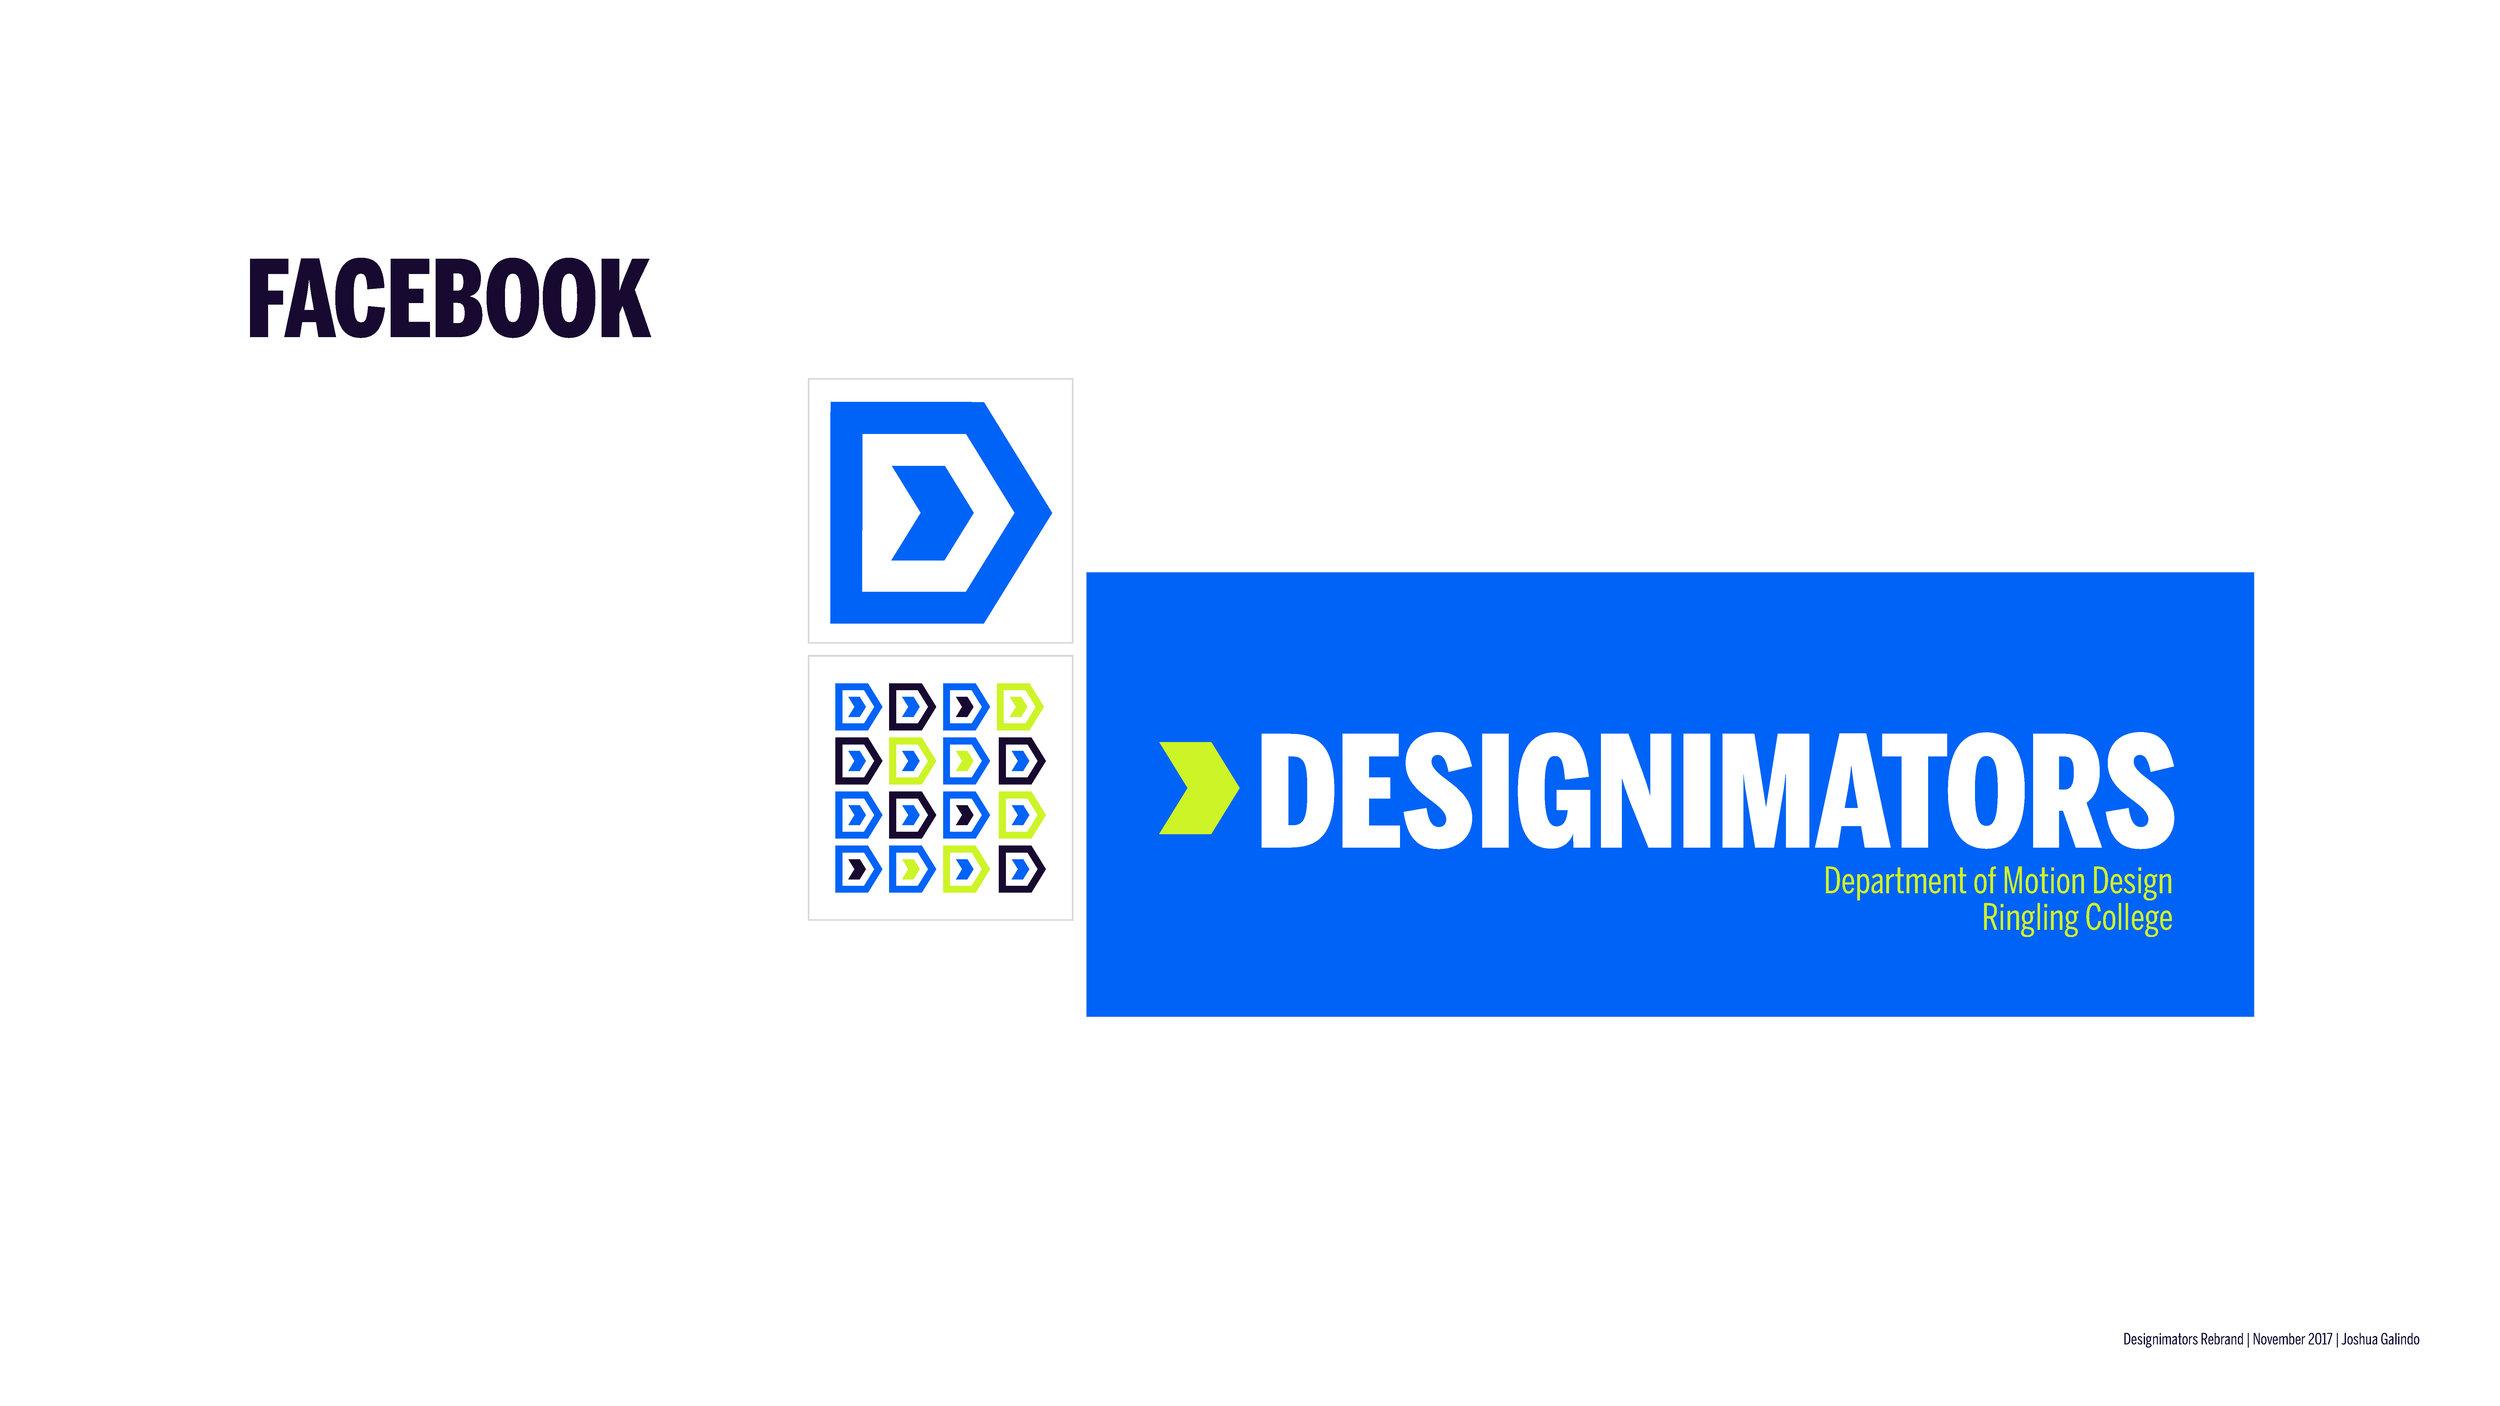 DeckFrame_Page_7.jpg